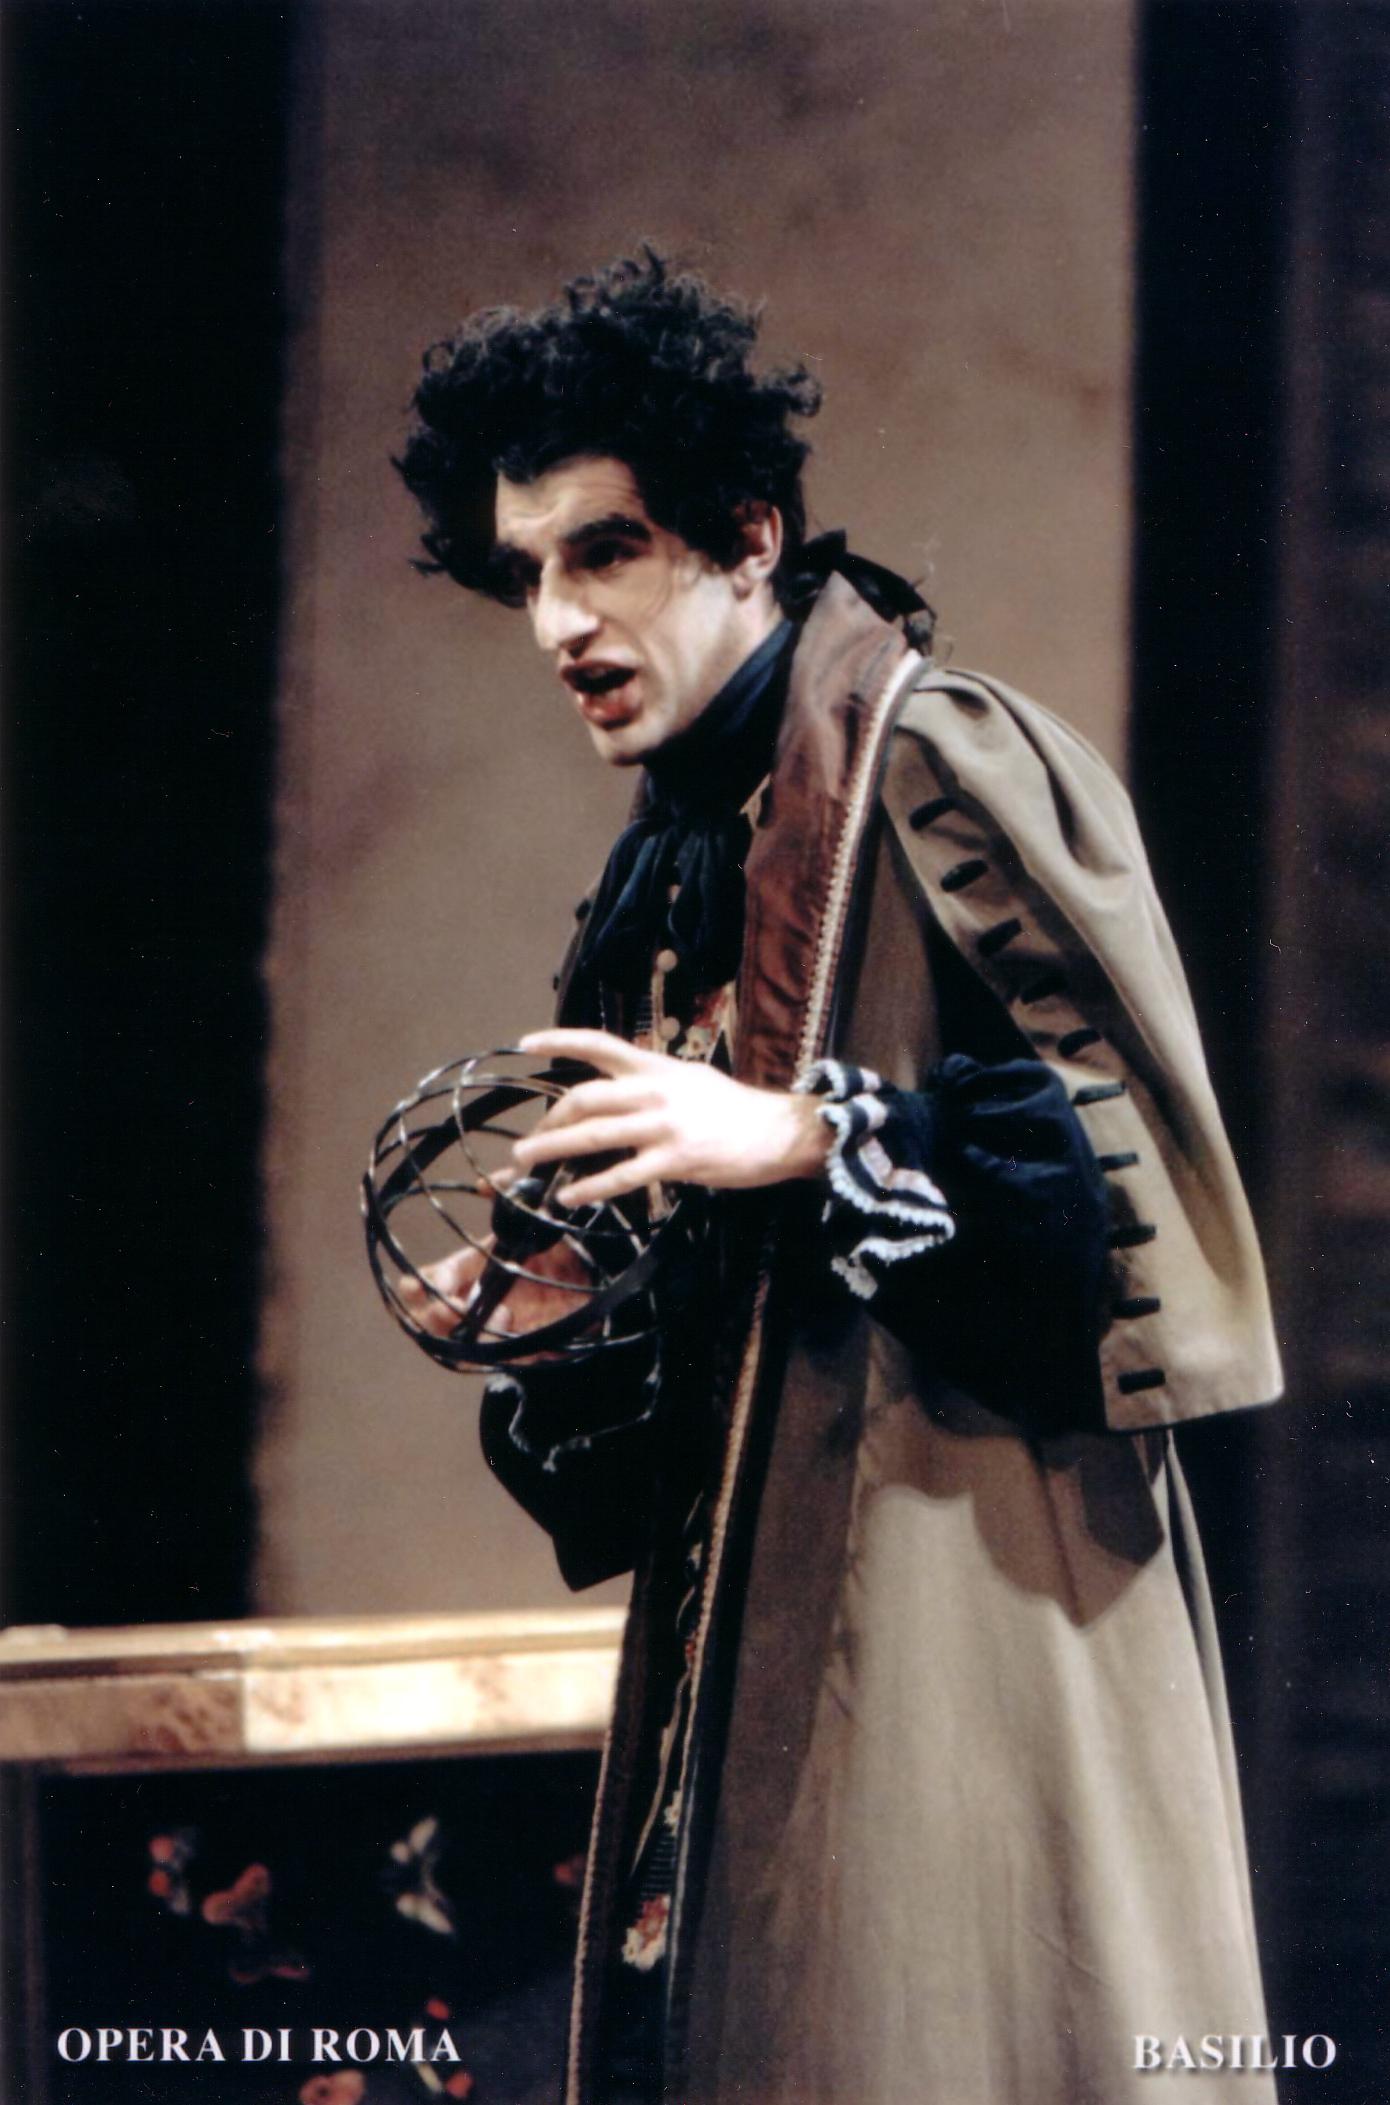 Basilio,Opera di Roma.